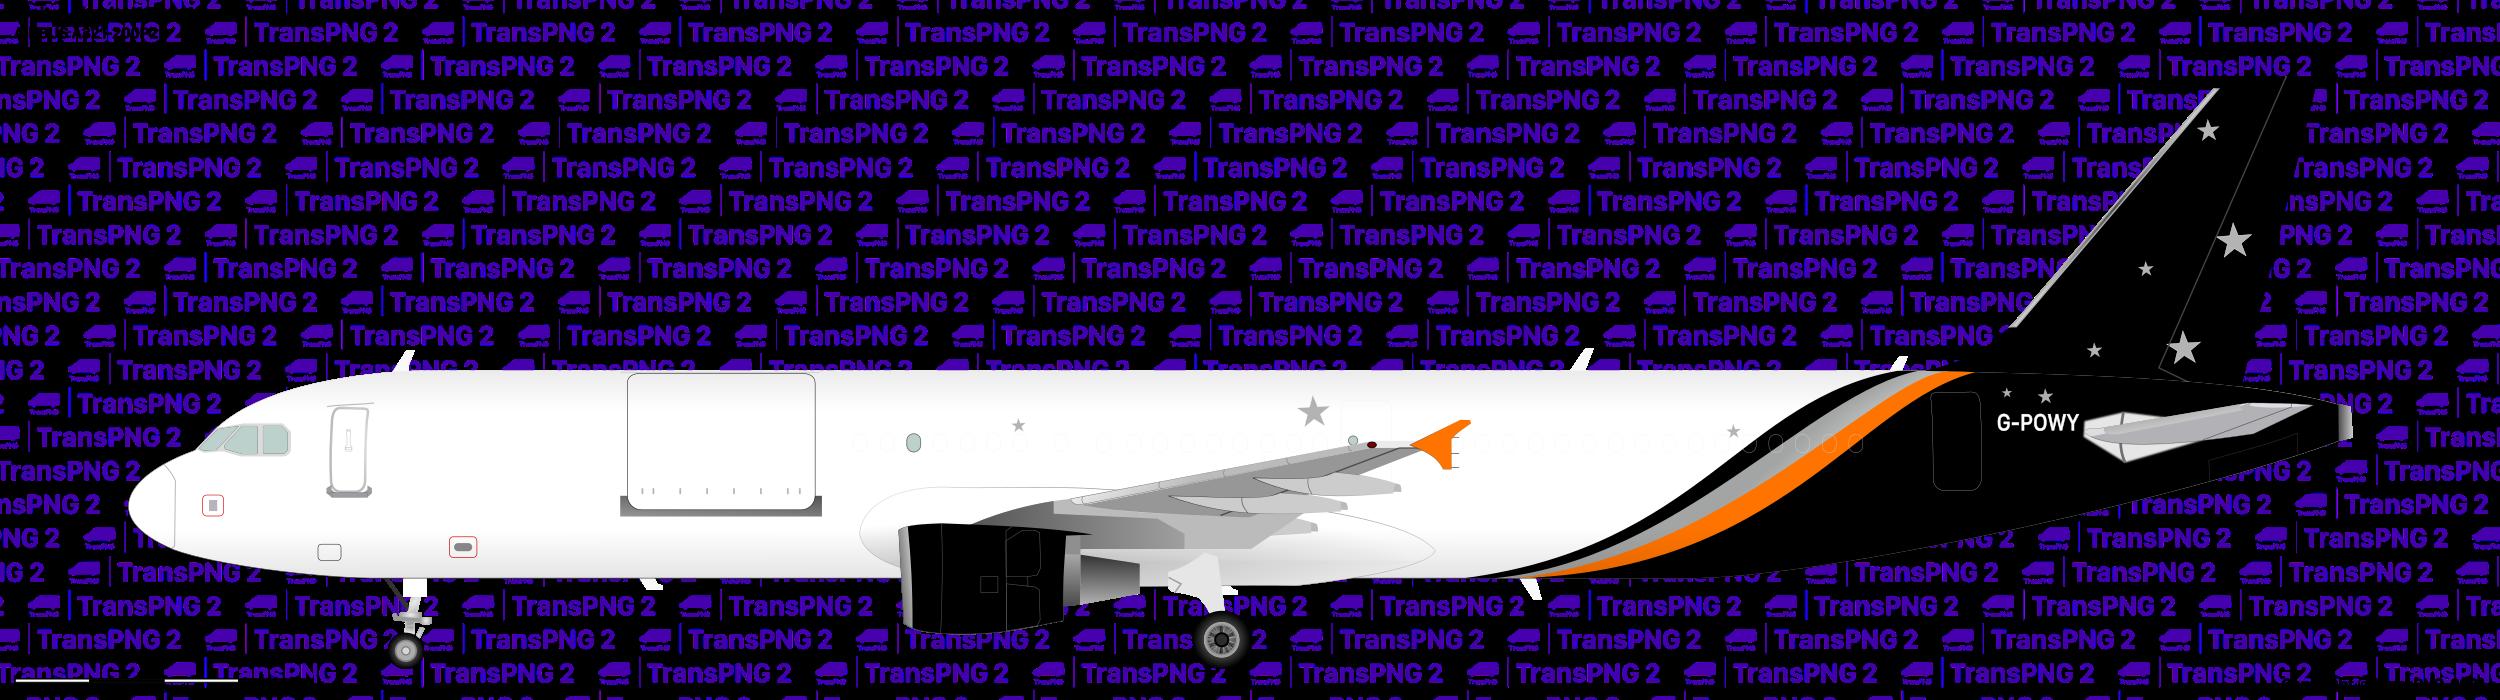 Airplane 25130